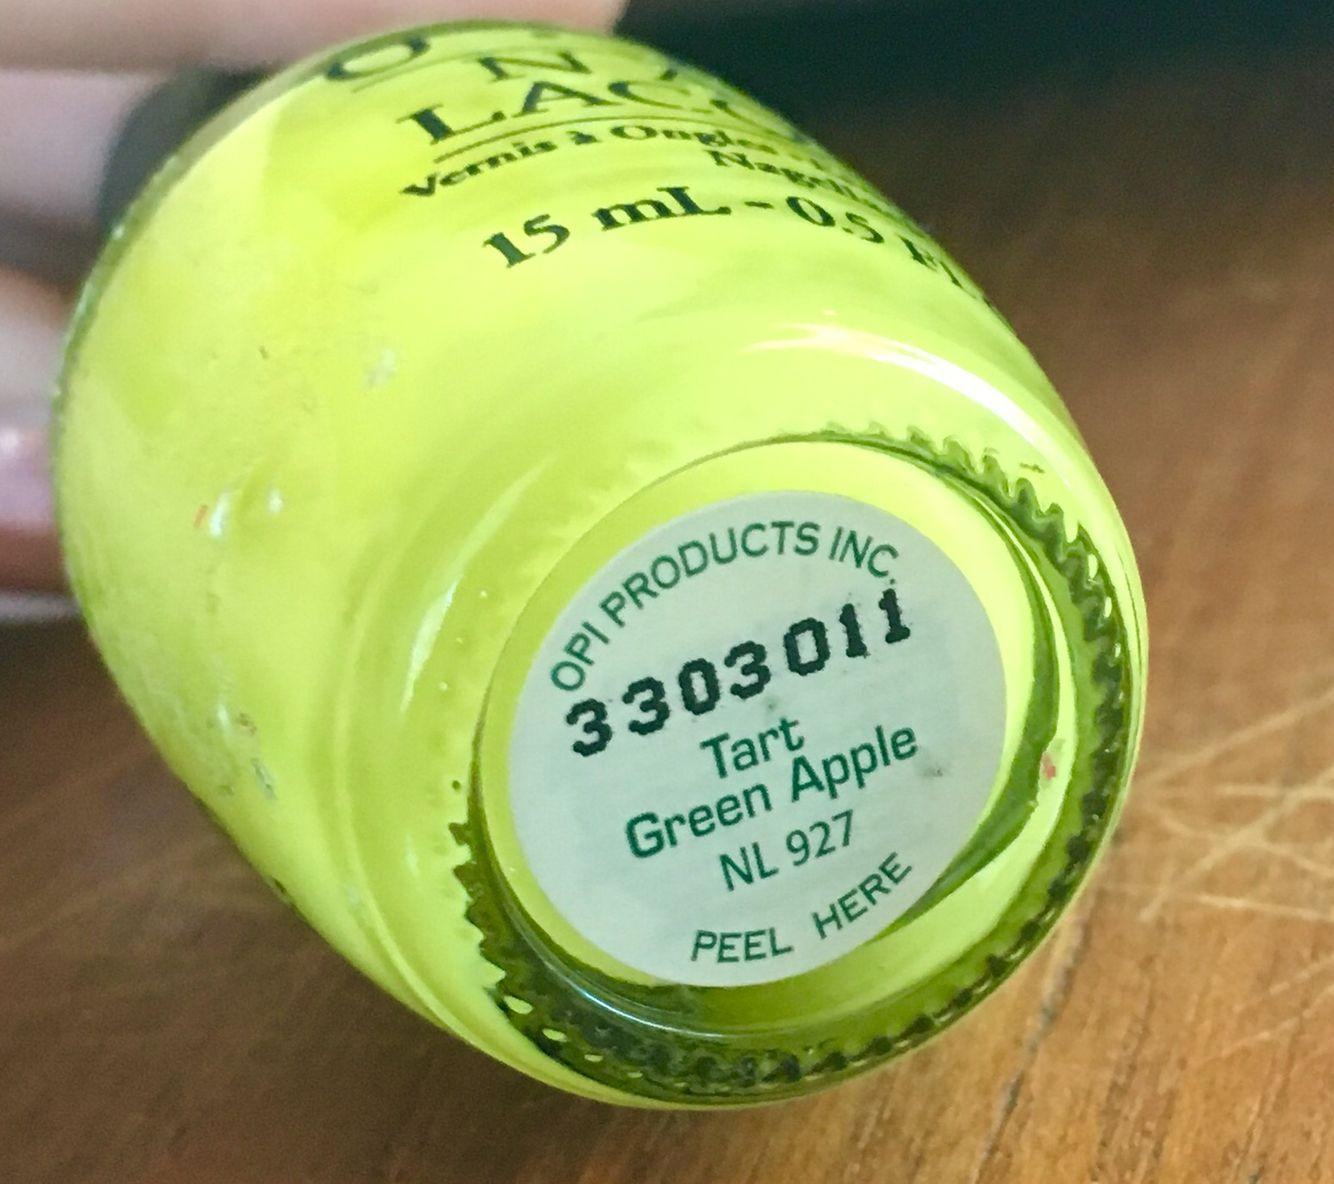 Opi Tart Green Le Nl 927 Htf Awesome Fall Color 14